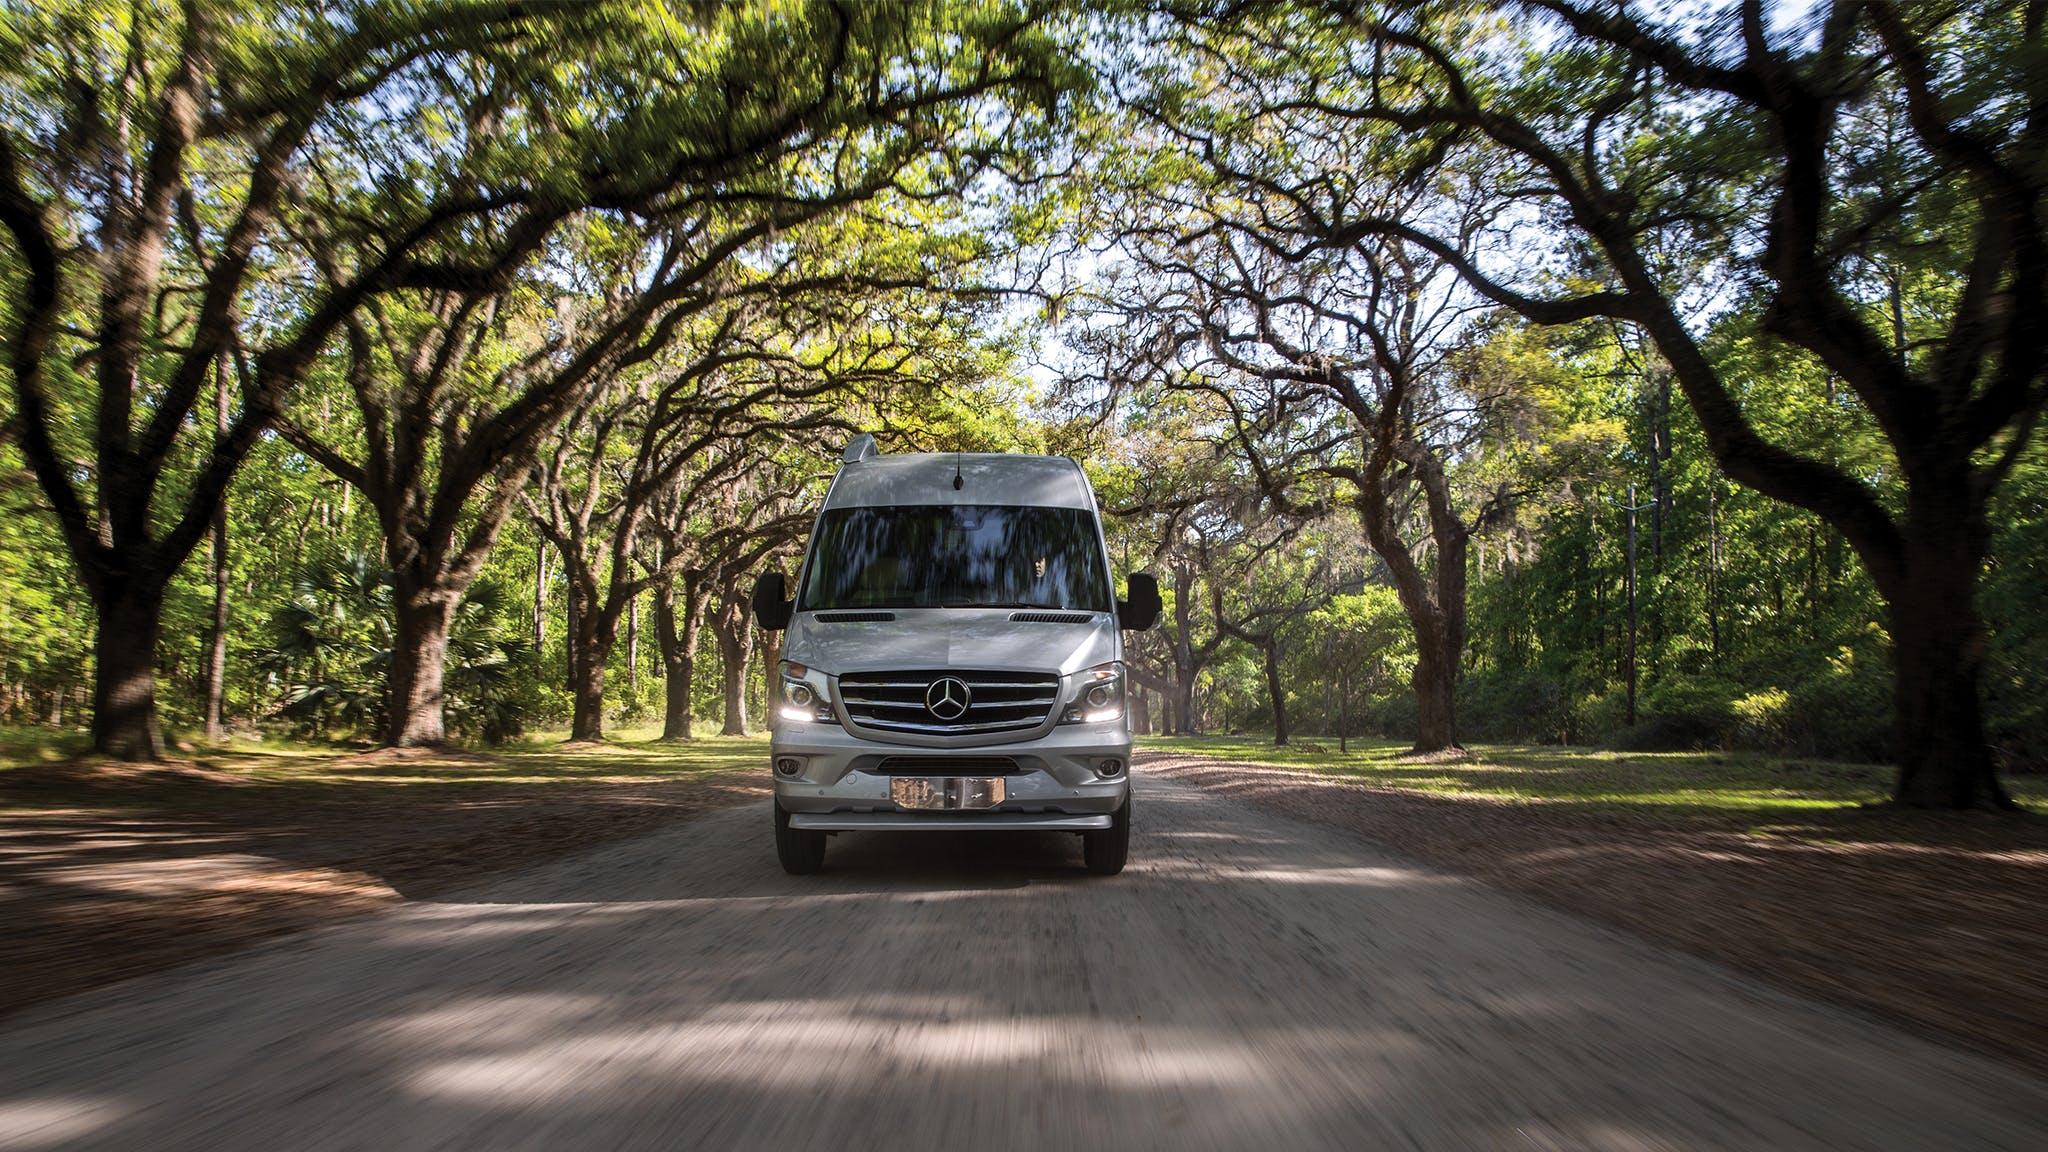 Airstream-Touring-Coach-Paying-it-Forward-blog-desktop-header